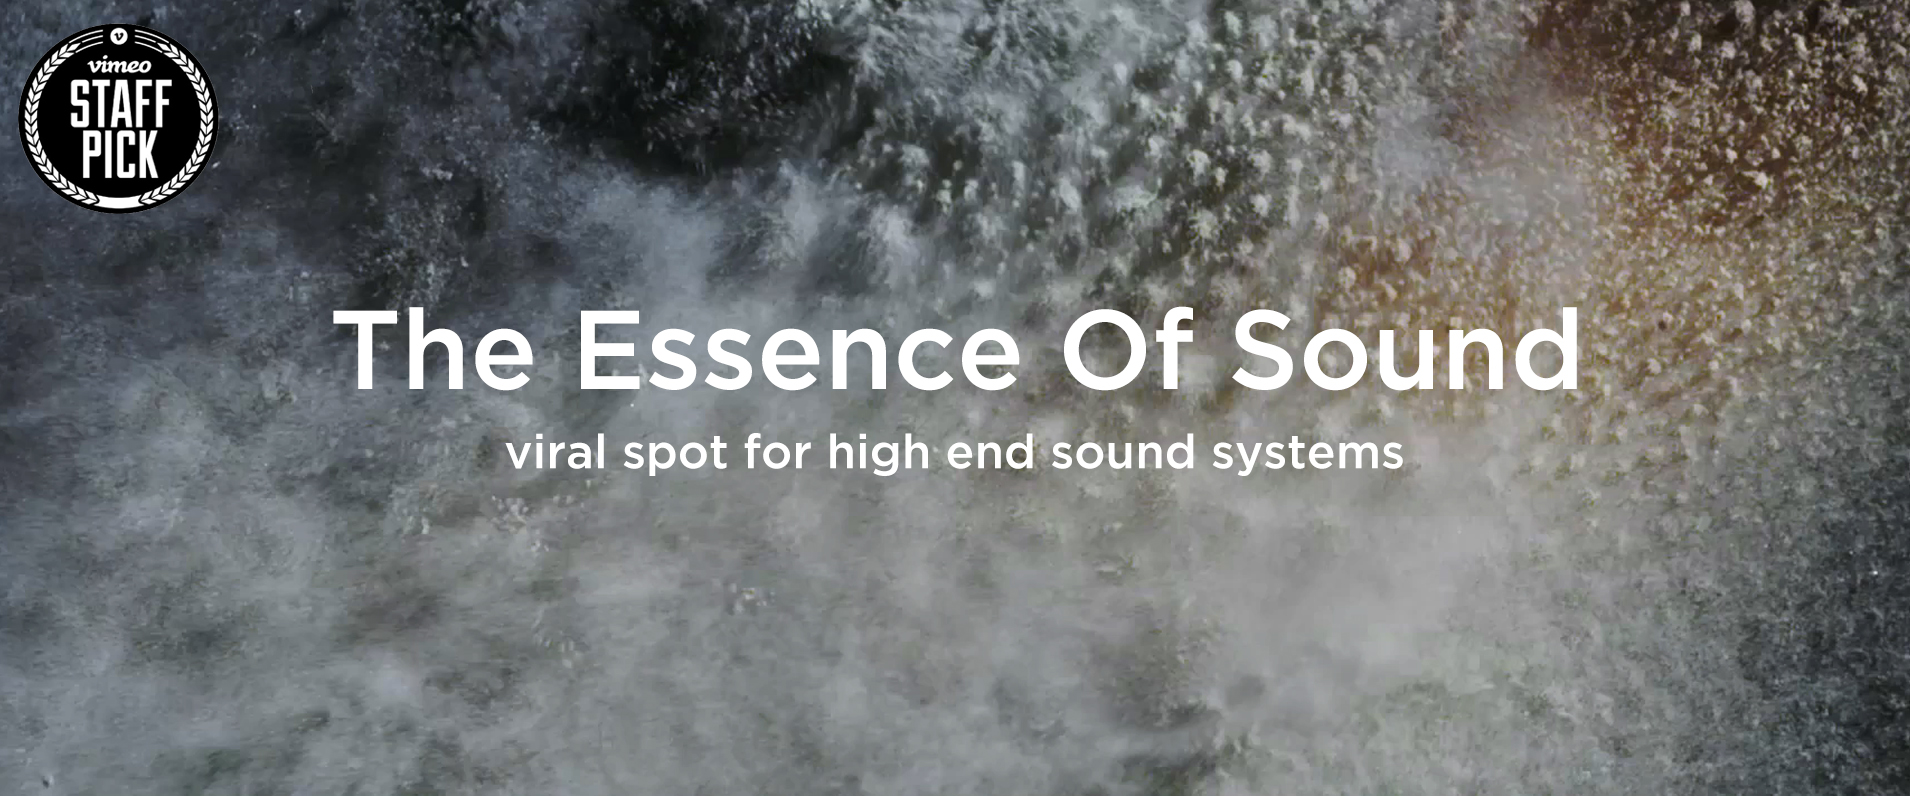 THE_ESSENCE_OF_SOUND